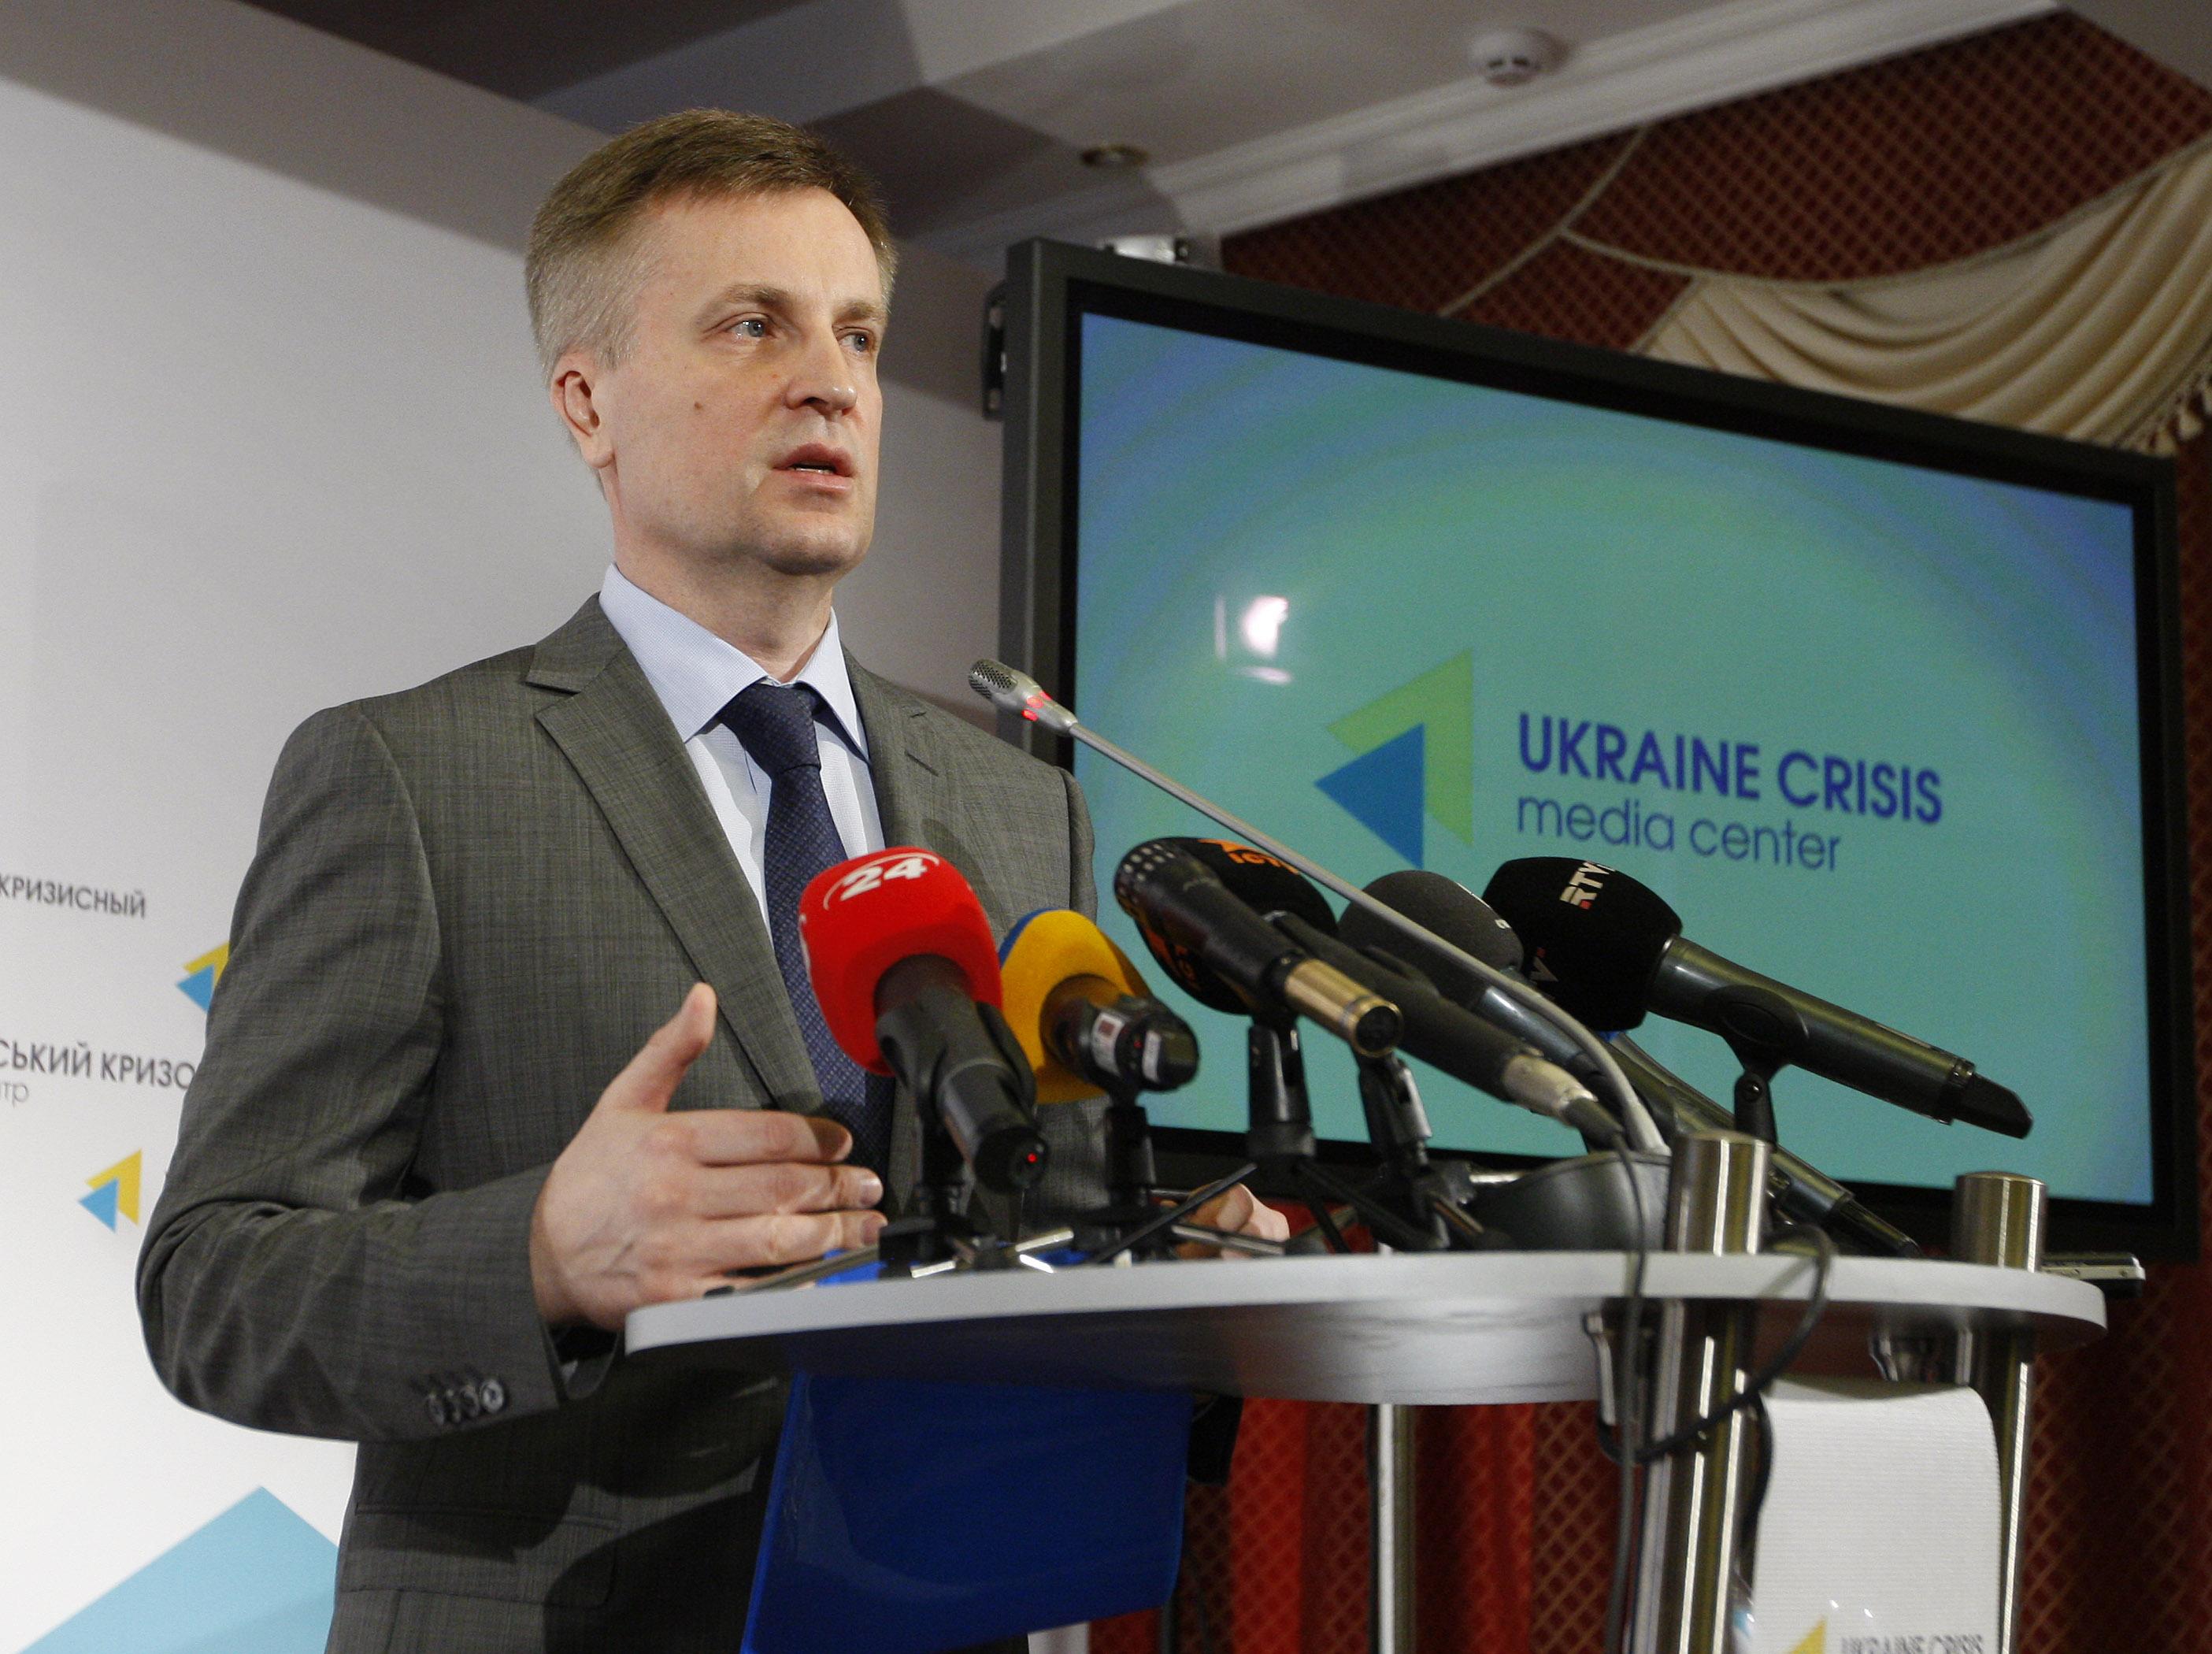 Руководитель СБУ Валентин Наливайченко